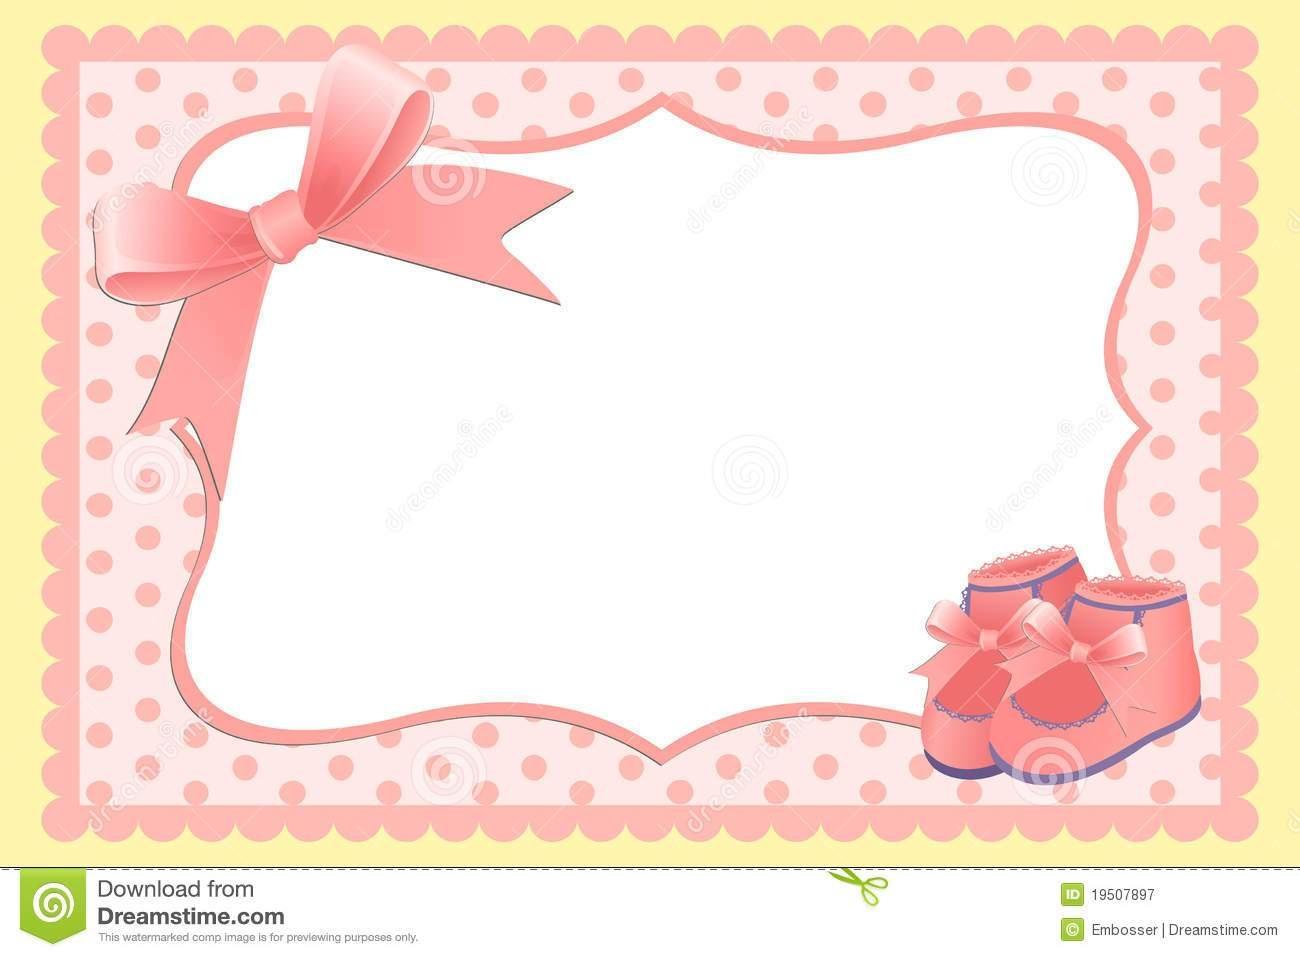 Free Printable Baby Cards Templates – Printall - Free Printable Baby Cards Templates